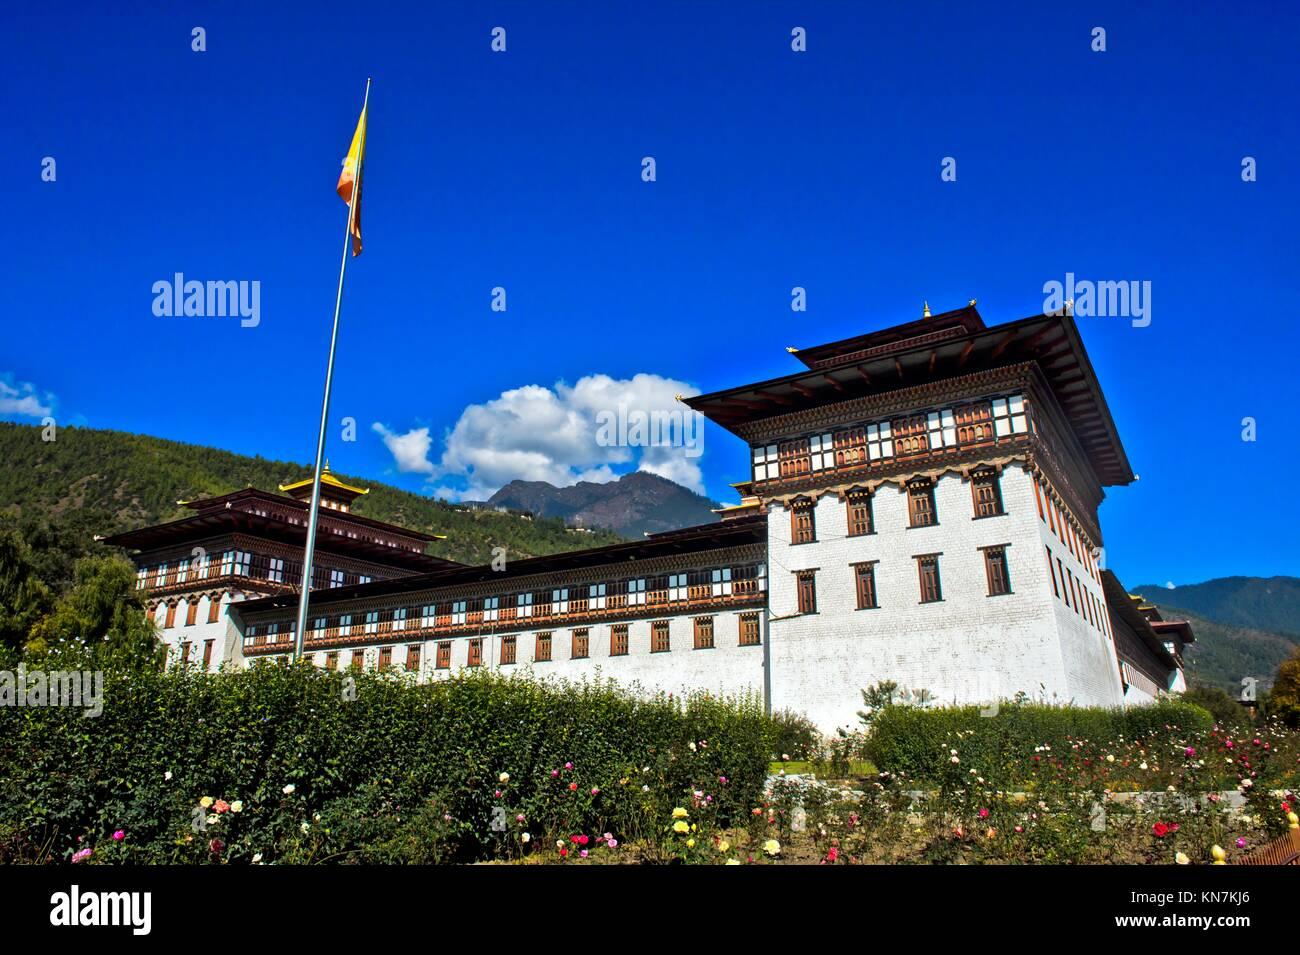 Siège du gouvernement Thimphu Dzong Trashi Chhoe Dzong ou dans le traditionnel style architecural, Thimphu, Photo Stock